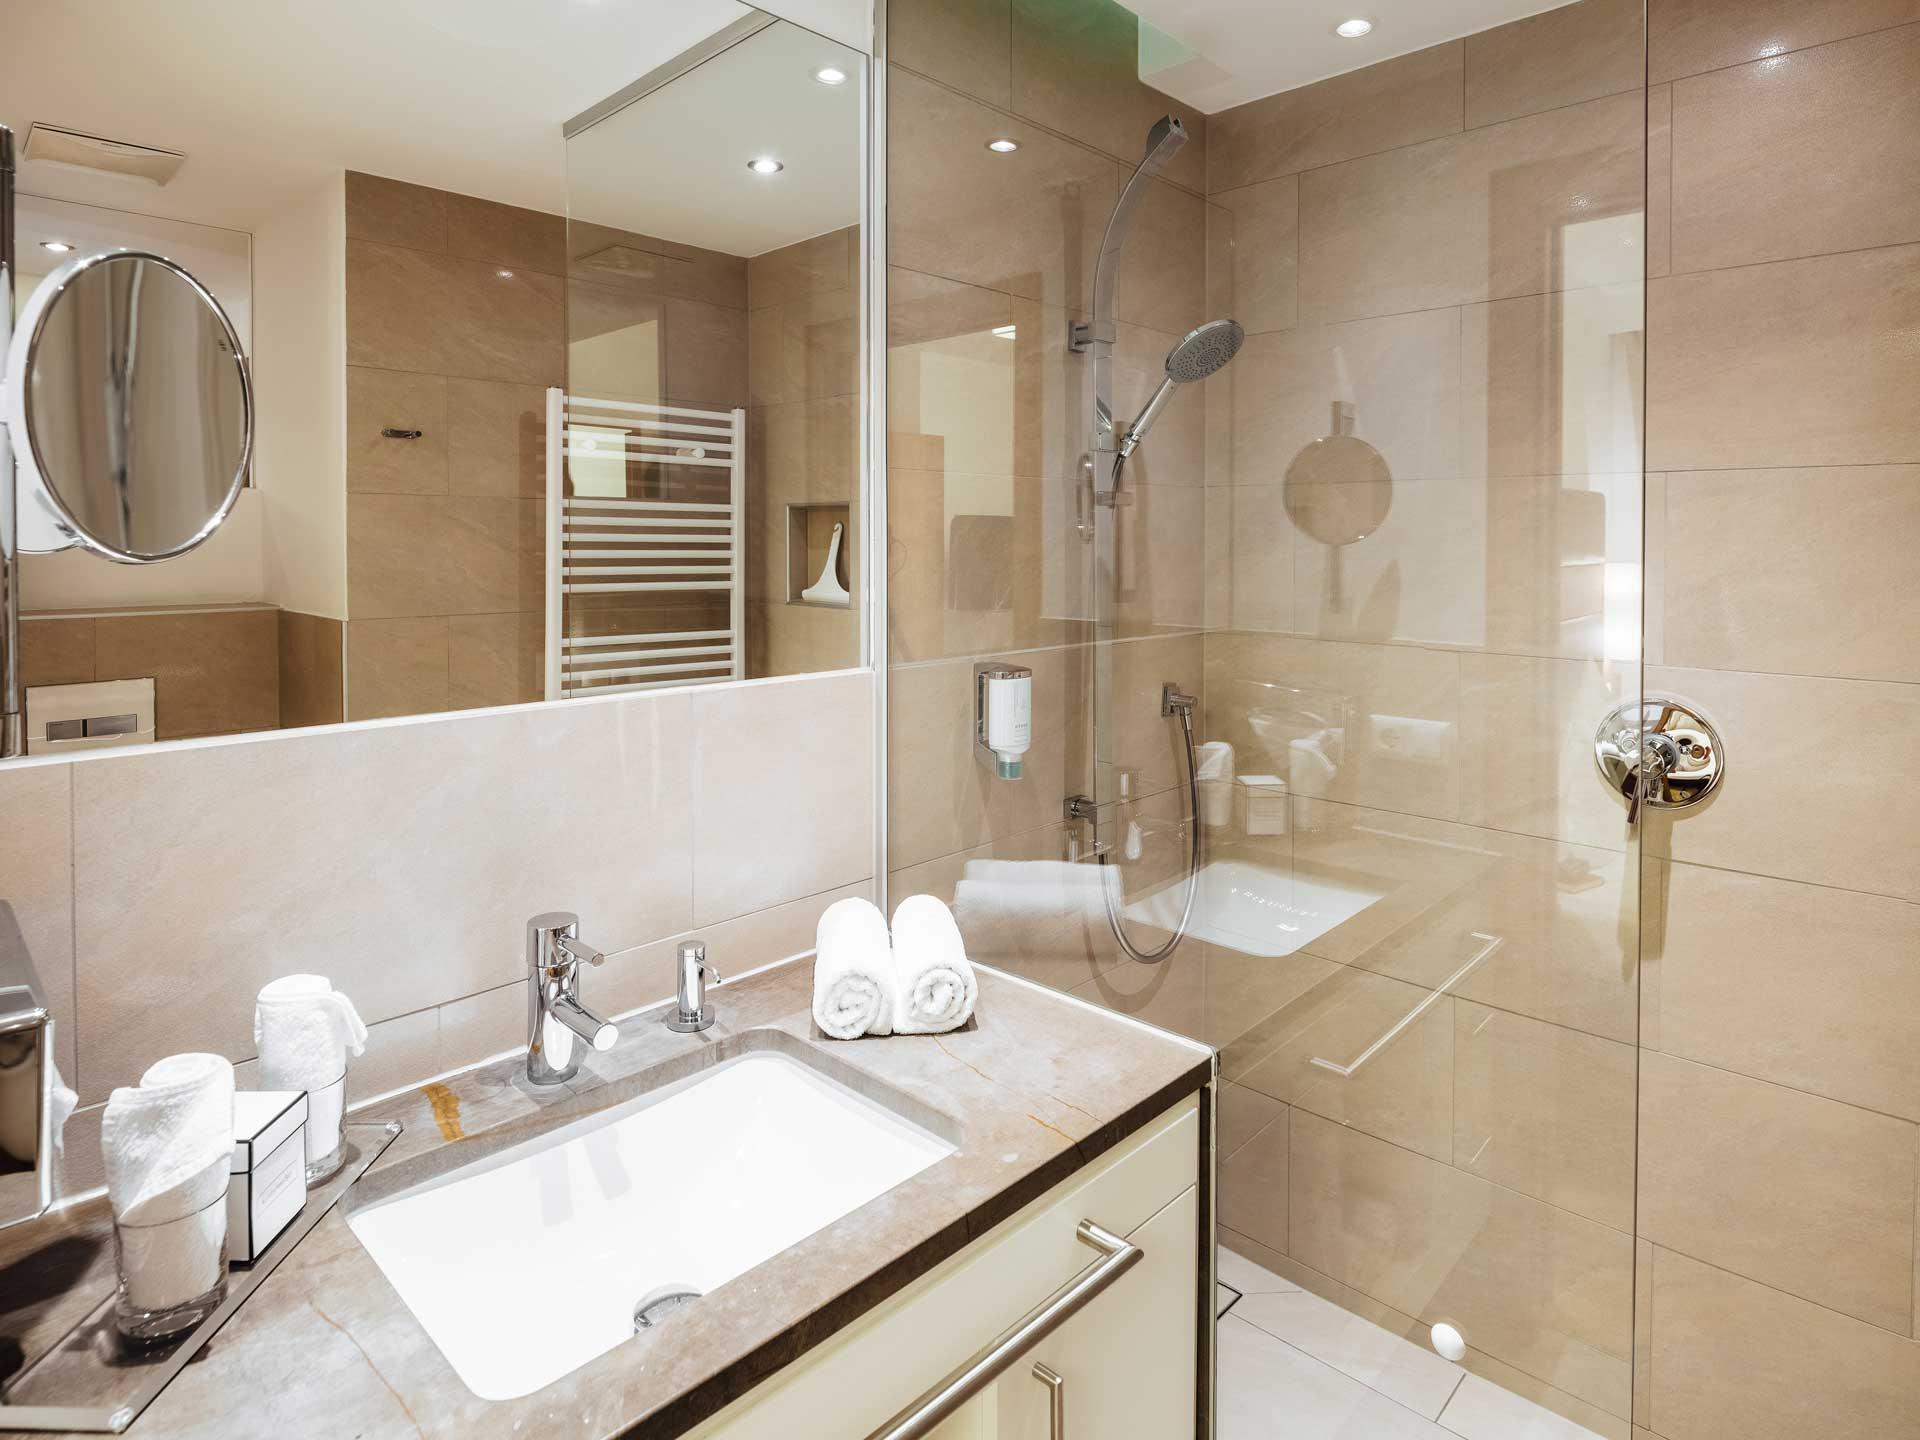 Glasgow Bathroom Complete